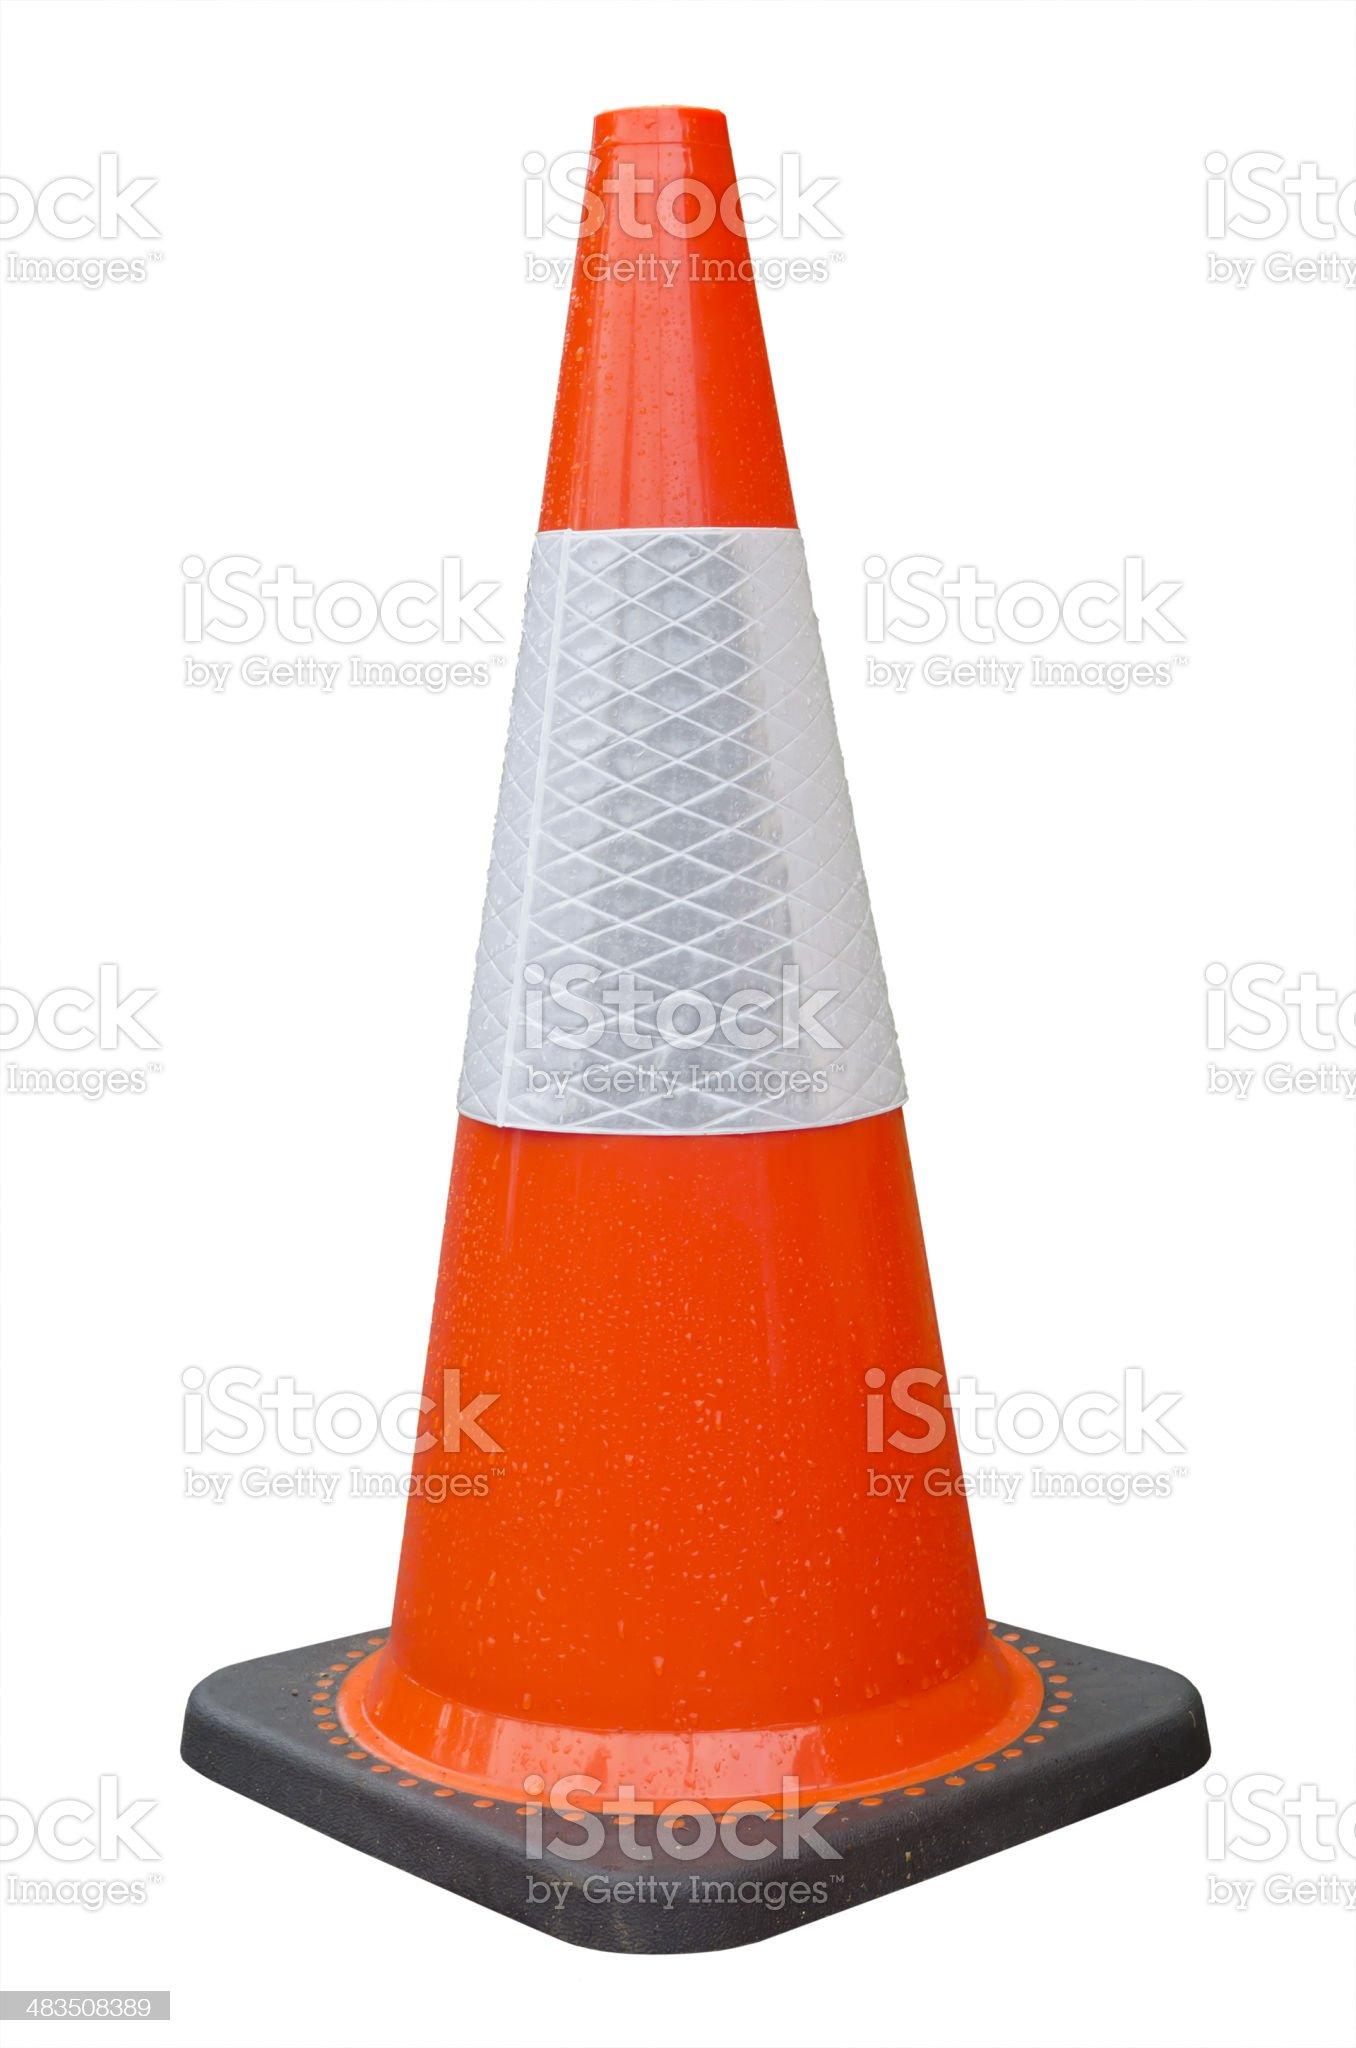 Bright orange traffic cone isolated on white background royalty-free stock photo